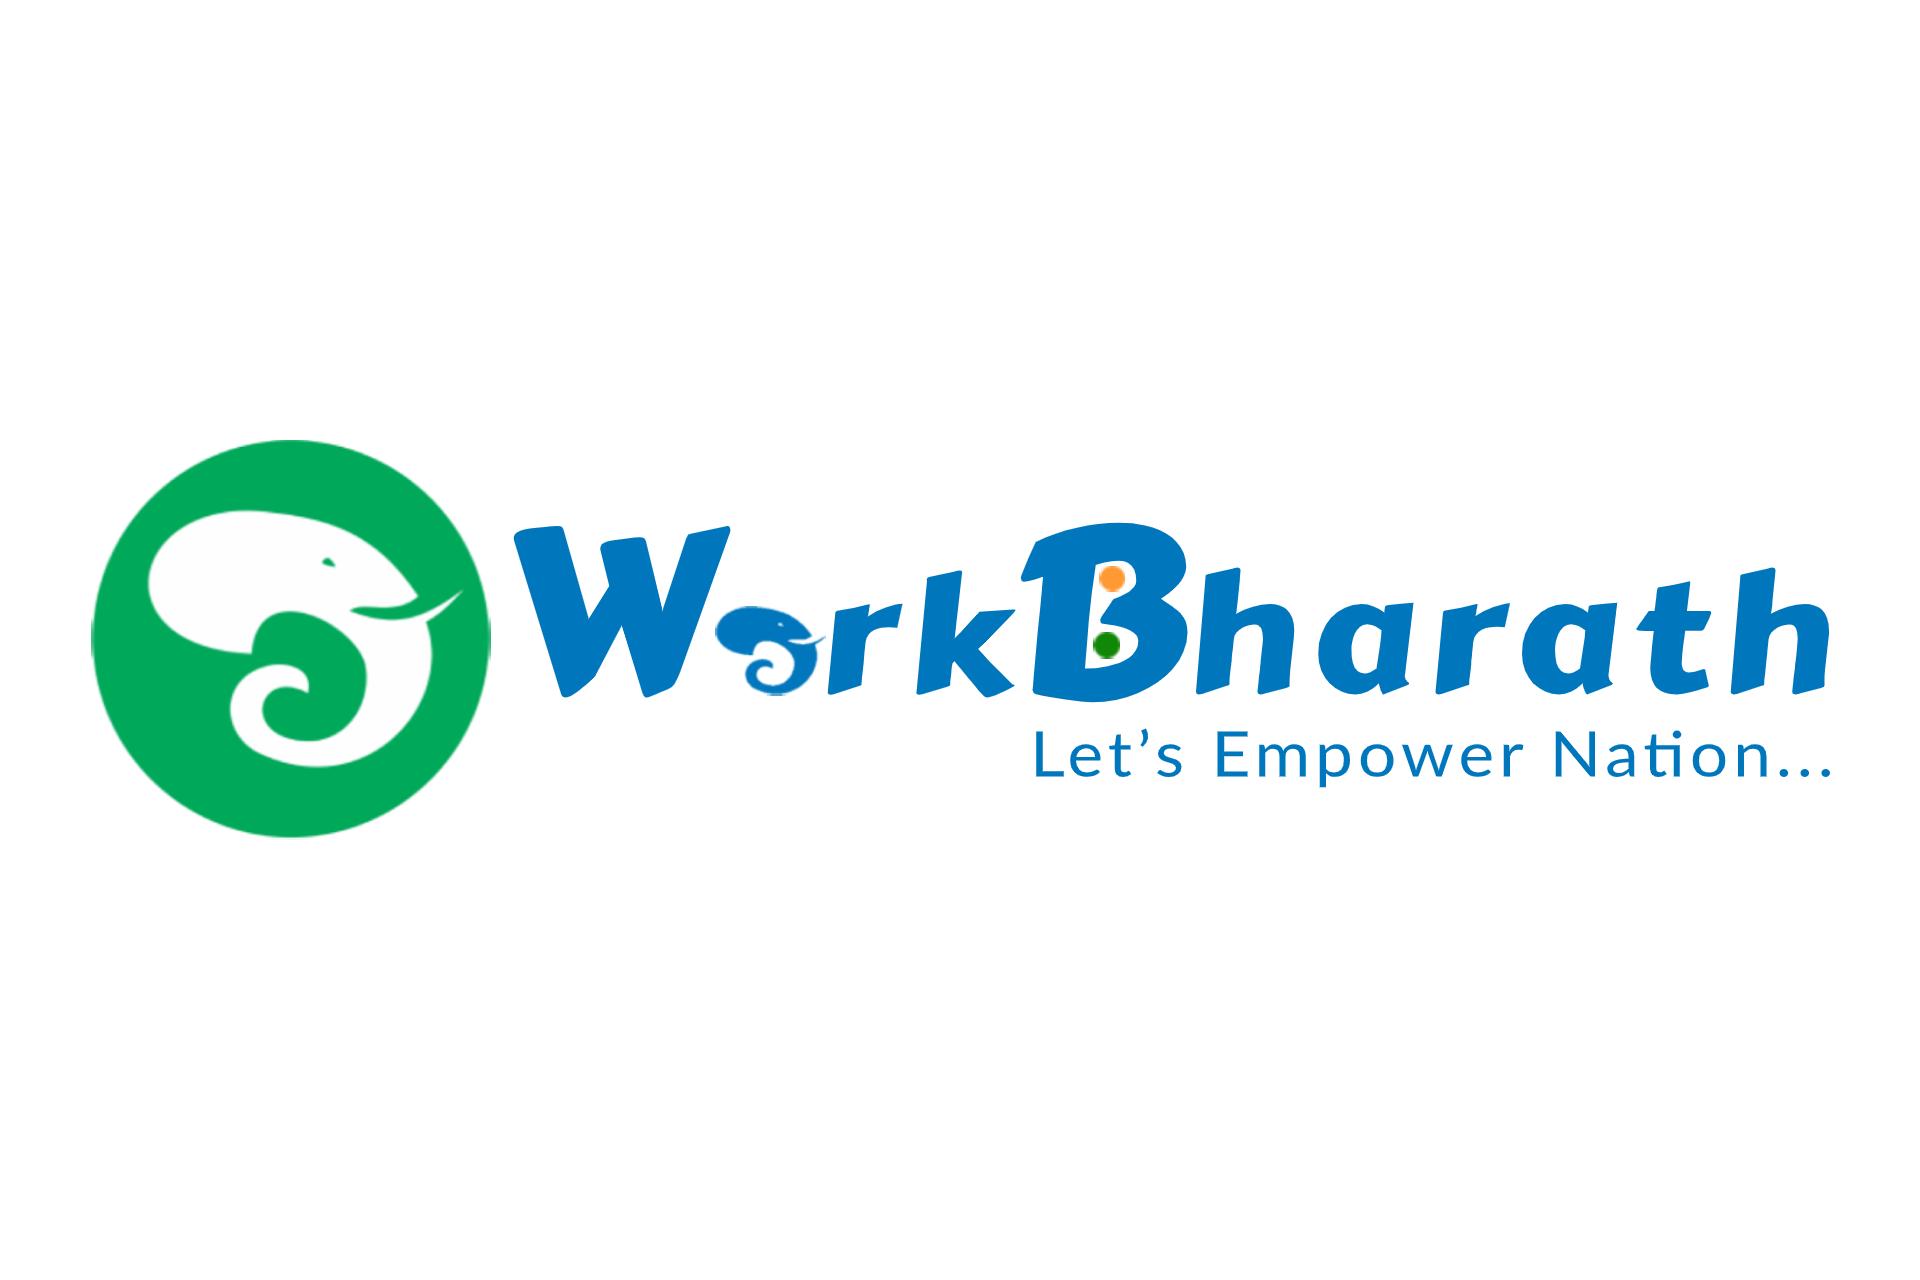 WorkBharath